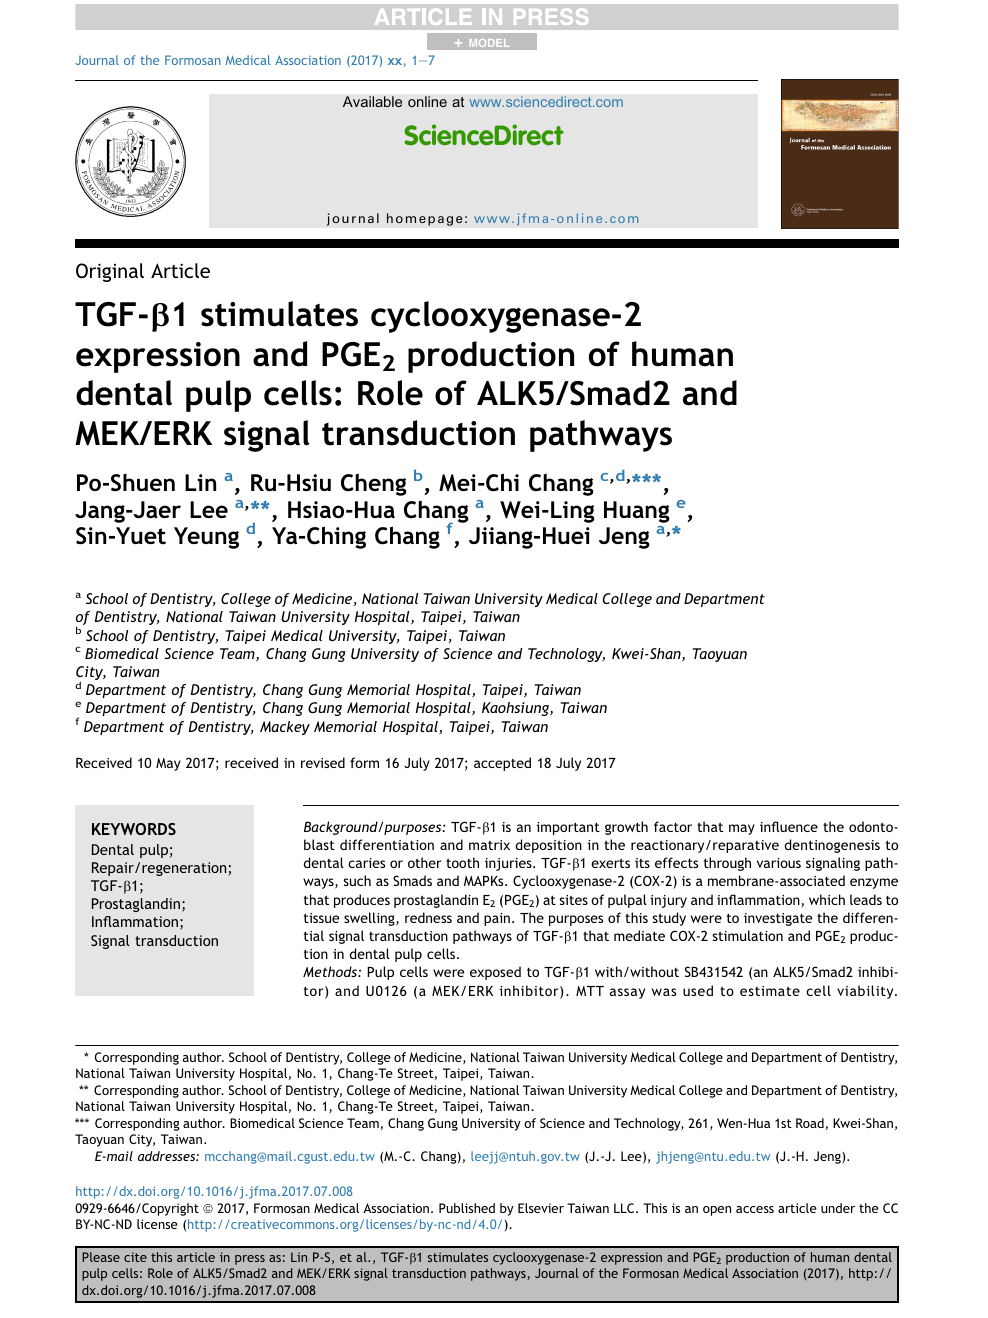 TGF-β1 stimulates cyclooxygenase-2 expression and PGE 2 production